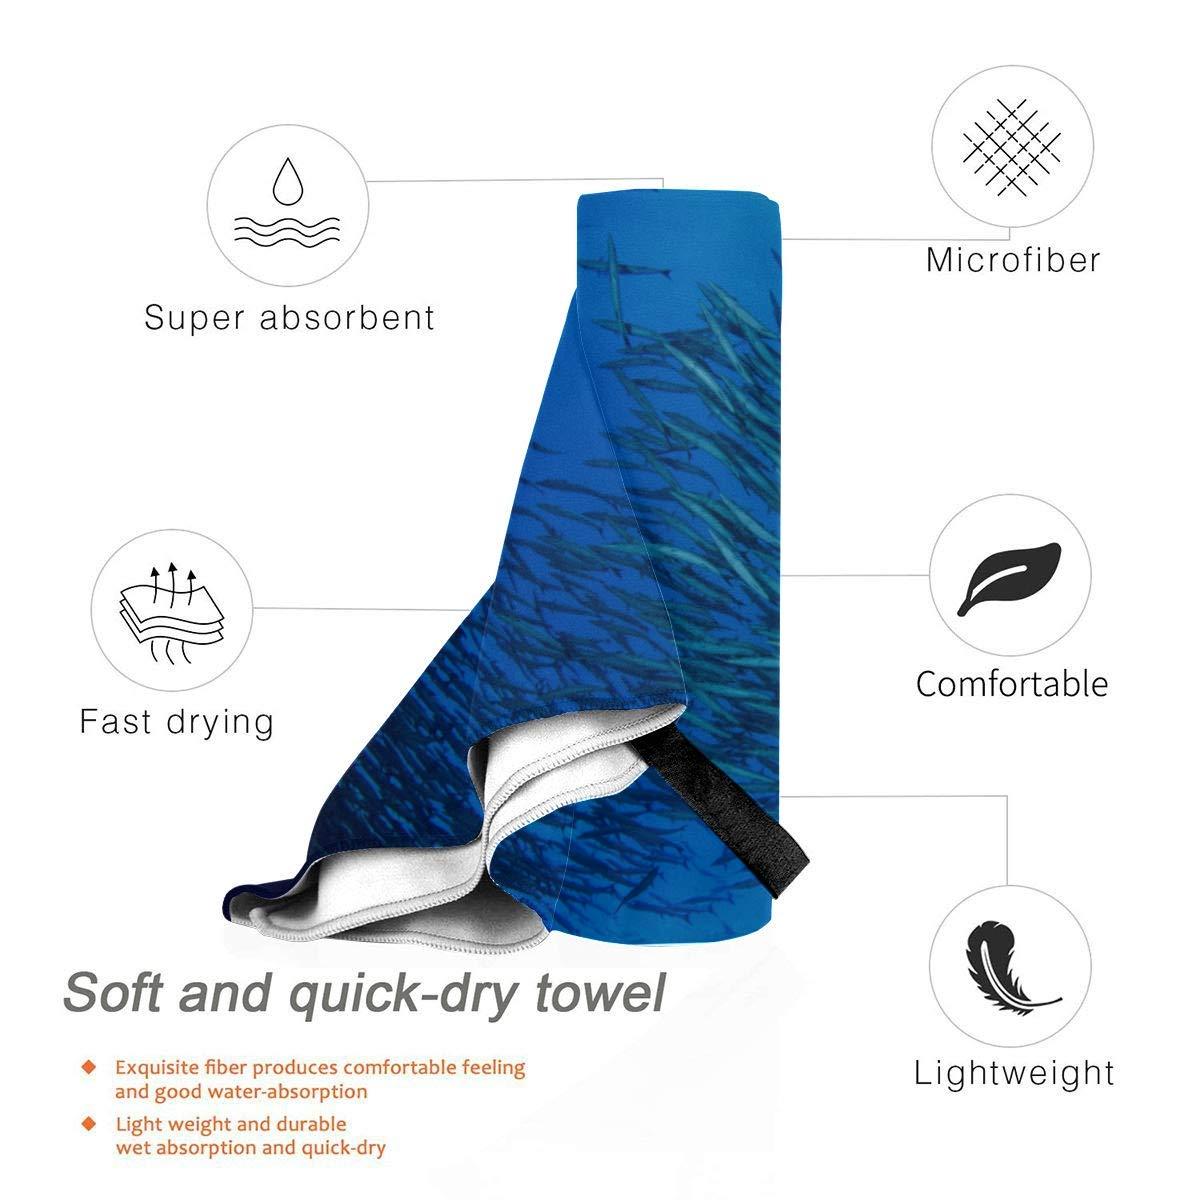 best For Gym Travel Camp Yoga Fitnes 70 X 130cm EIJODNL Coral Reef Sea Fish Microfiber Towel Blanket Sports Towels Hiking Microfiber Towel Beach Towel Quick Dry 27.5 X 51